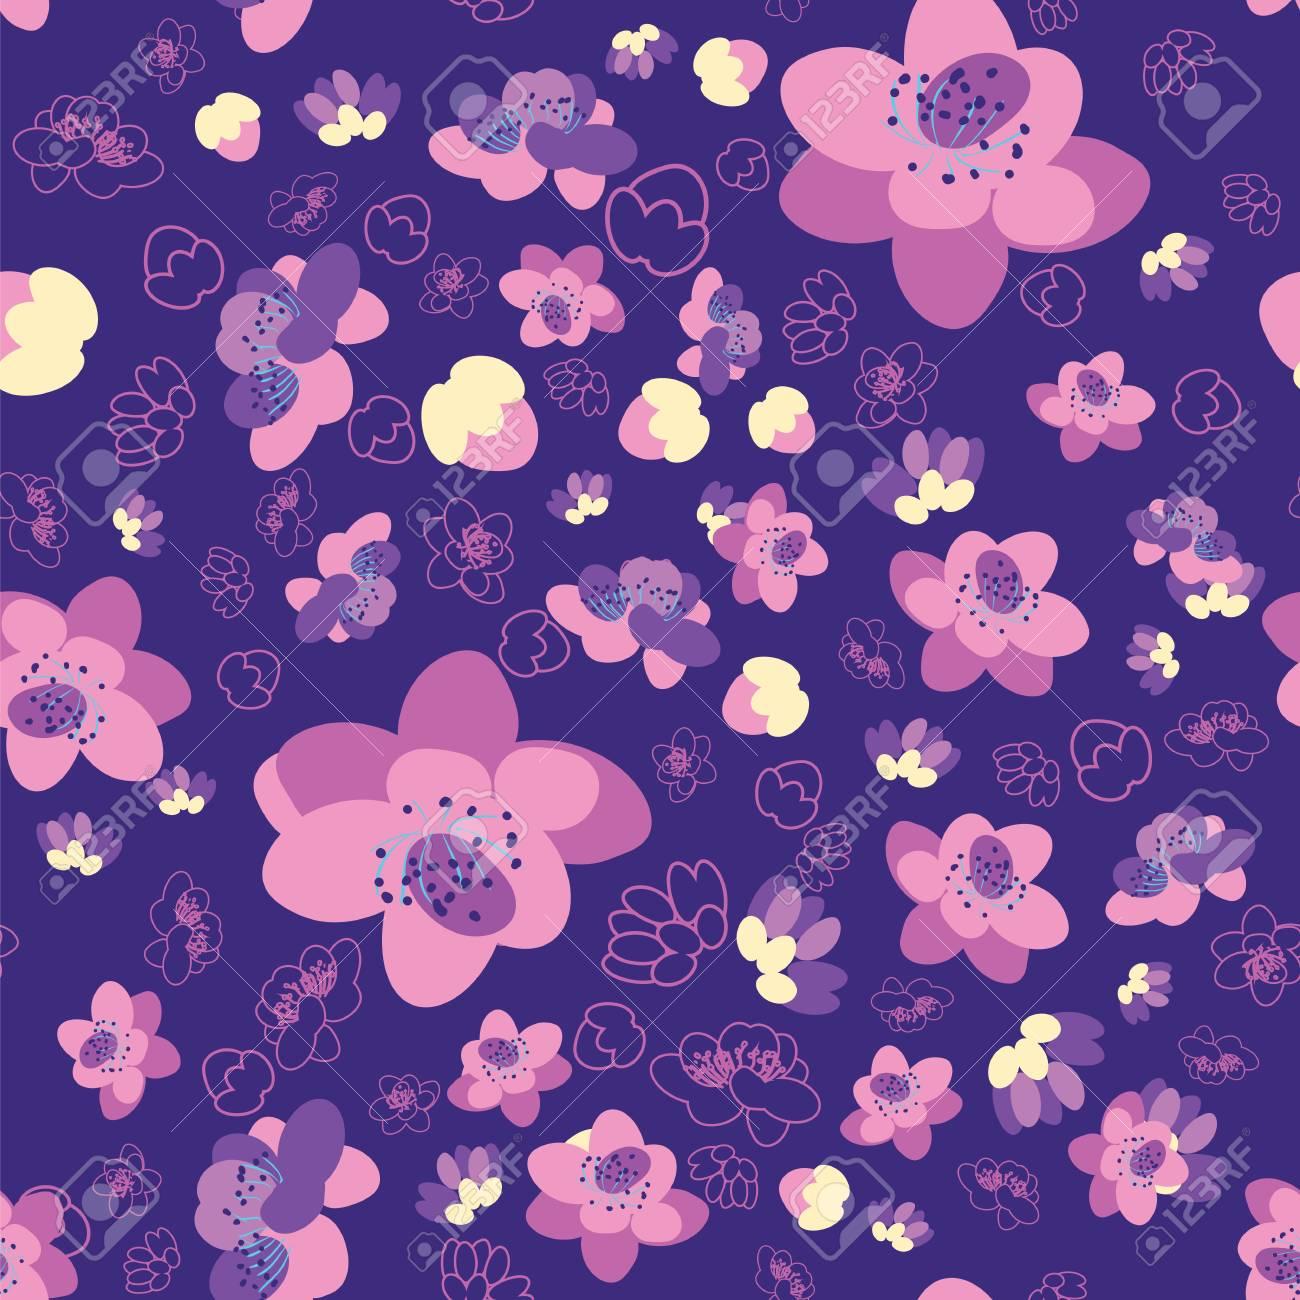 Fond Trendy Seamless Fleur Sakura Cerisier Japonais Branche Et